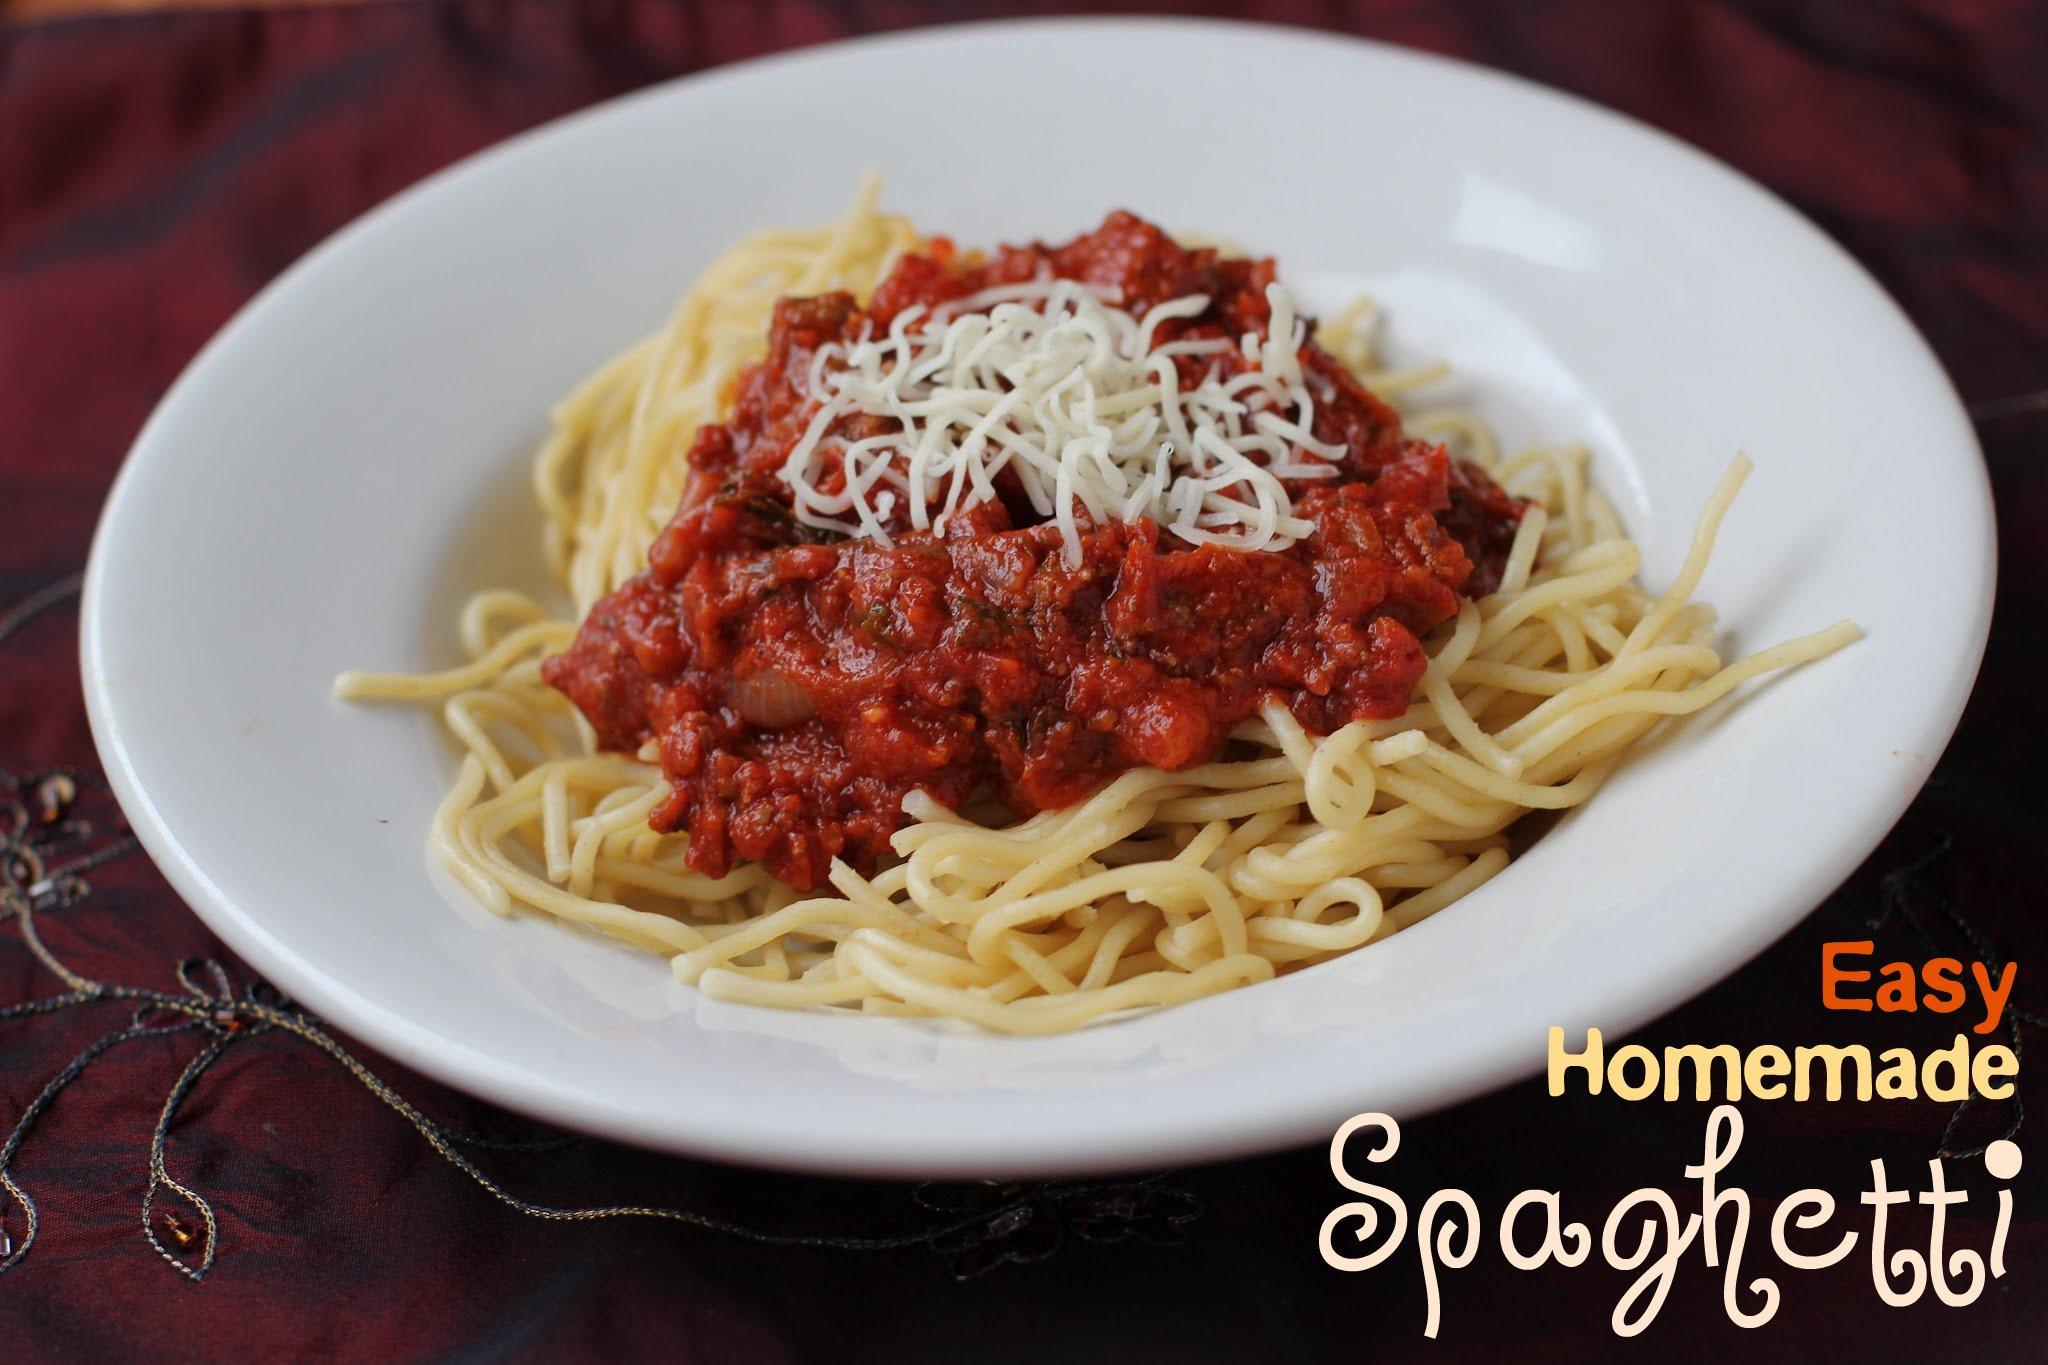 Simple Spaghetti Sauce Recipe  Easy Homemade Spaghetti Sauce Great for the Freezer